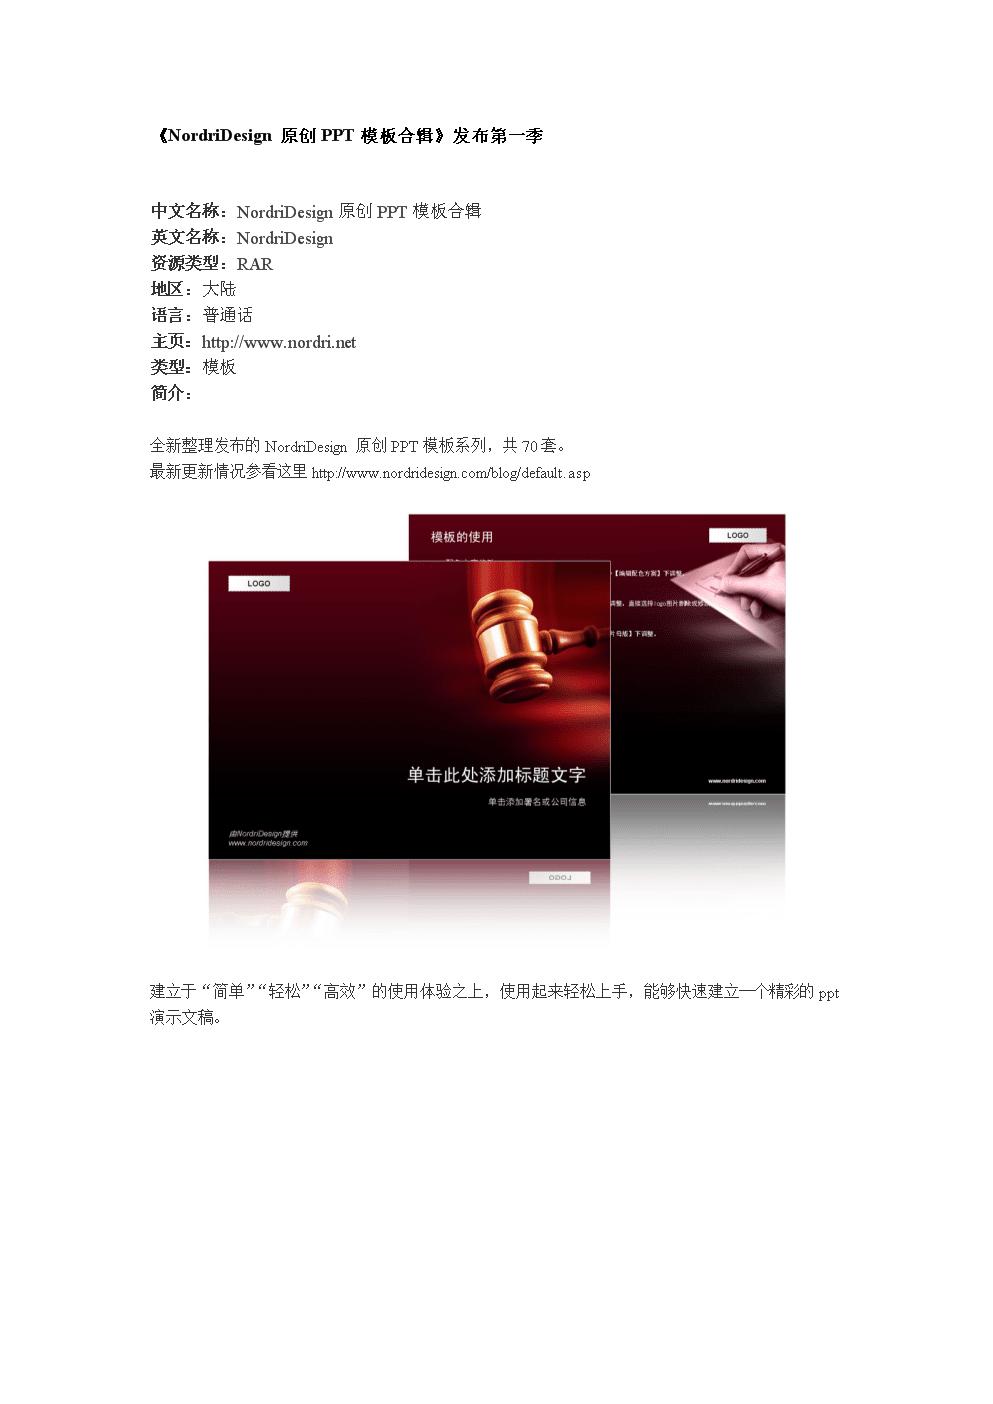 《NordriDesign原創PPT模板合輯》發布.doc